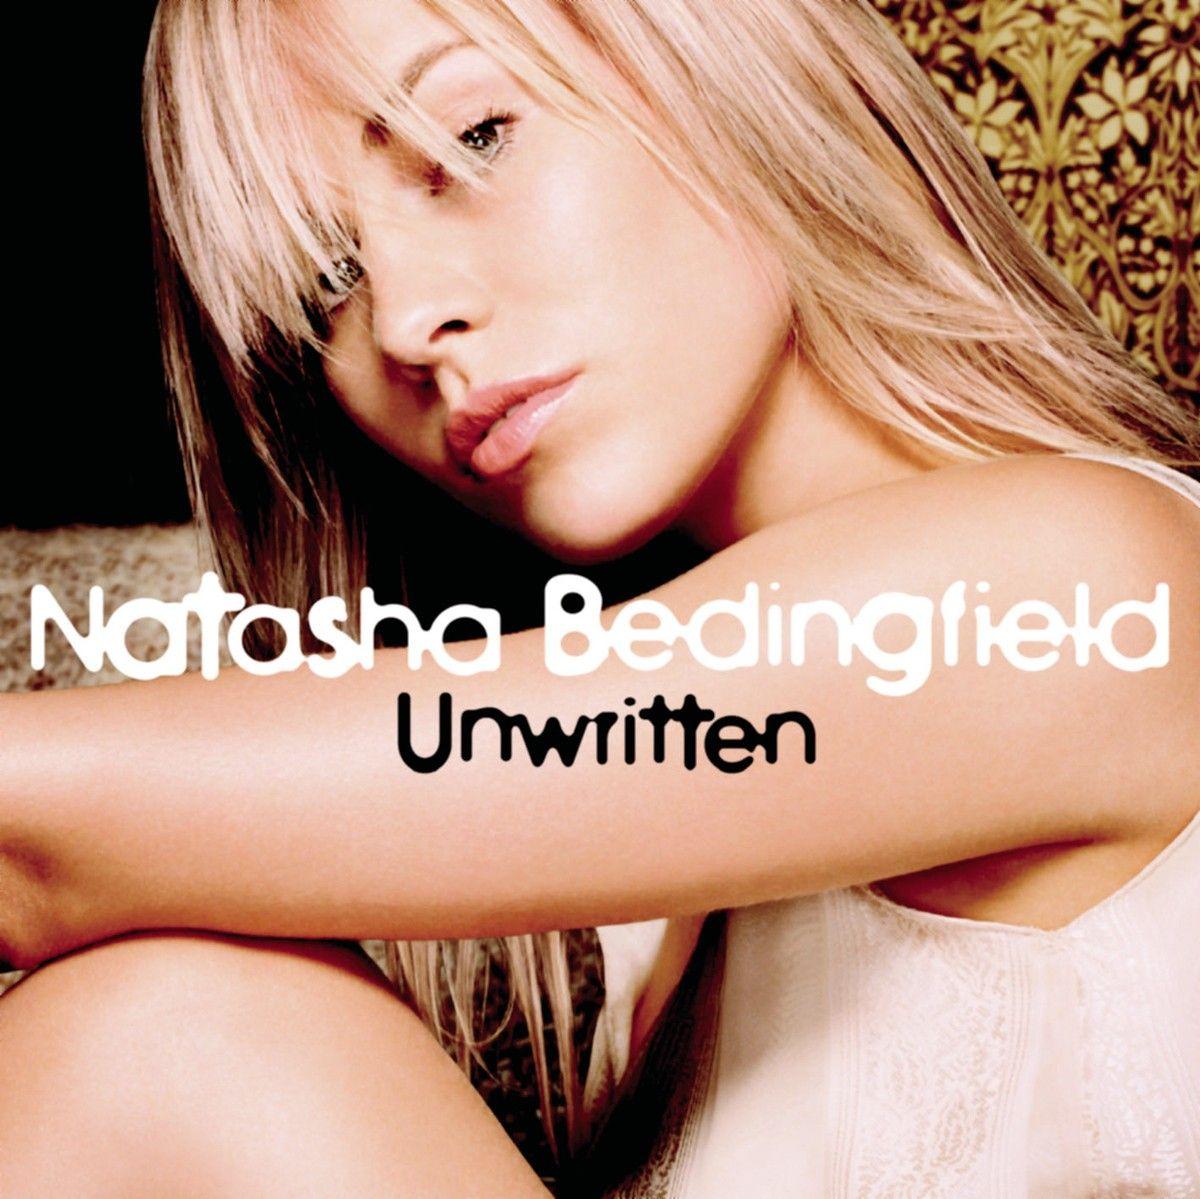 Natasha Bedingfield - Unwritten album cover